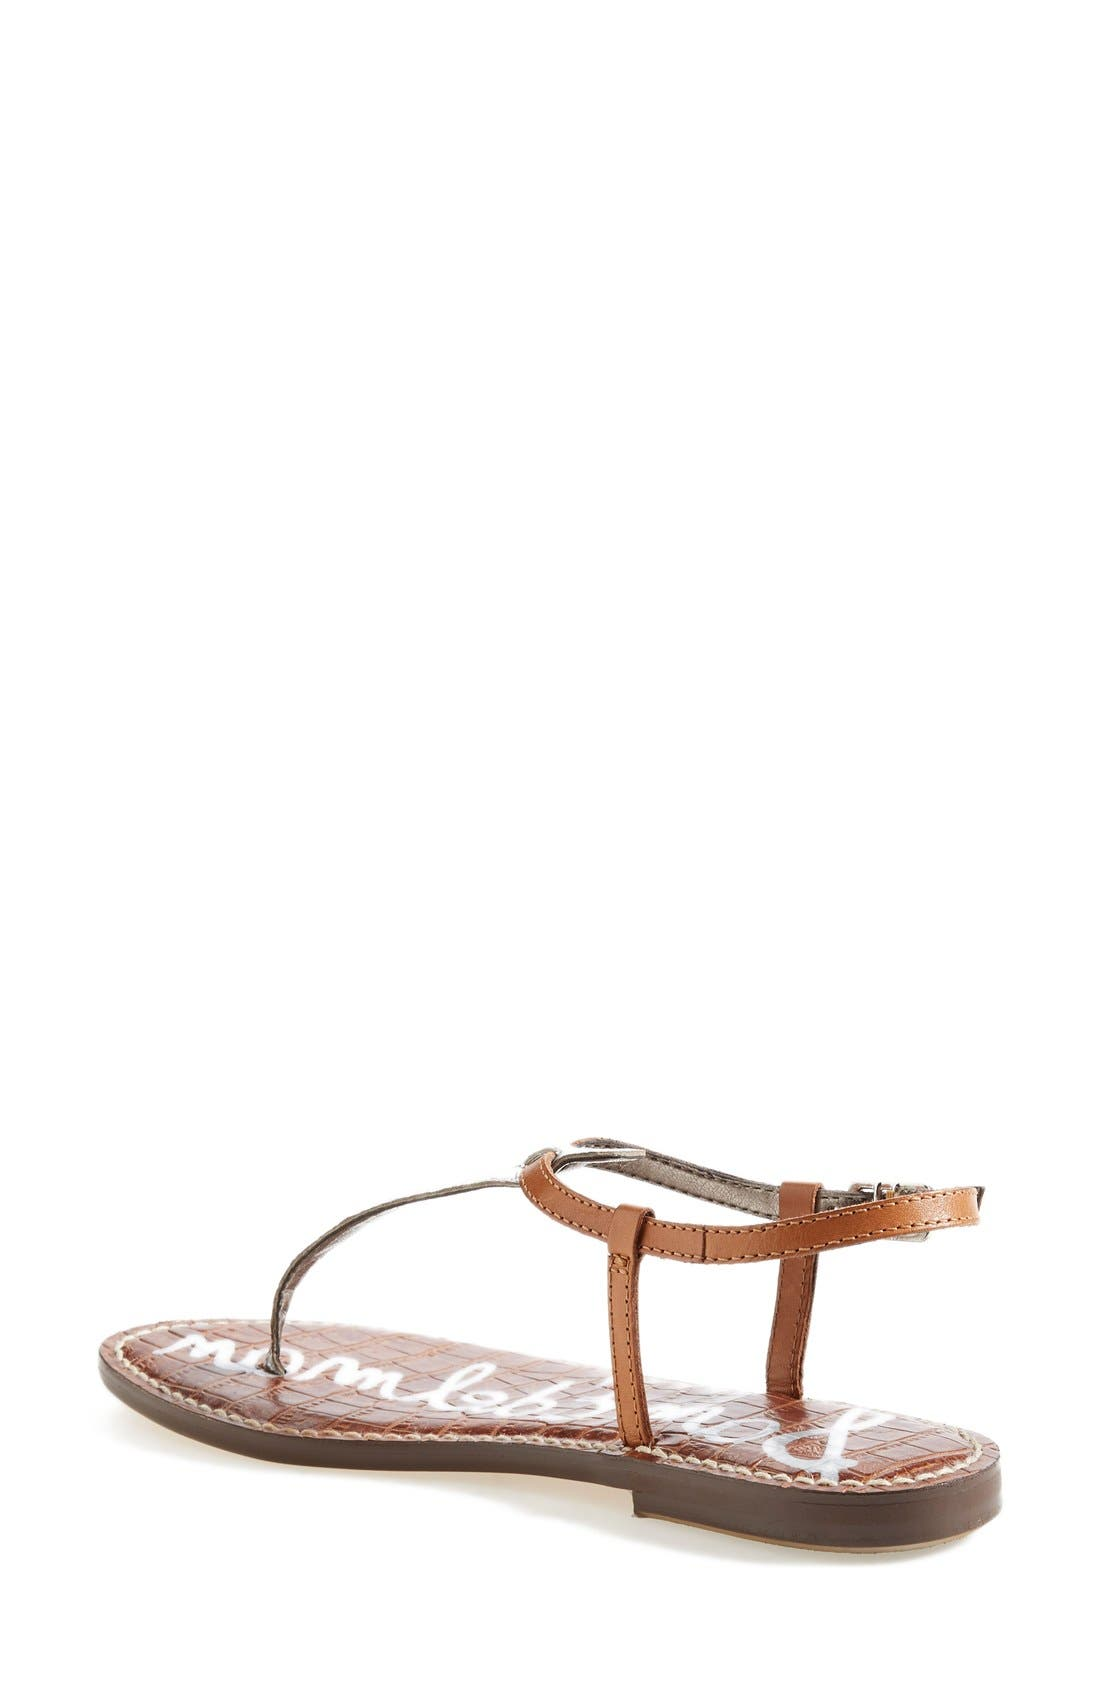 'Gigi' Leather Sandal,                             Alternate thumbnail 3, color,                             045